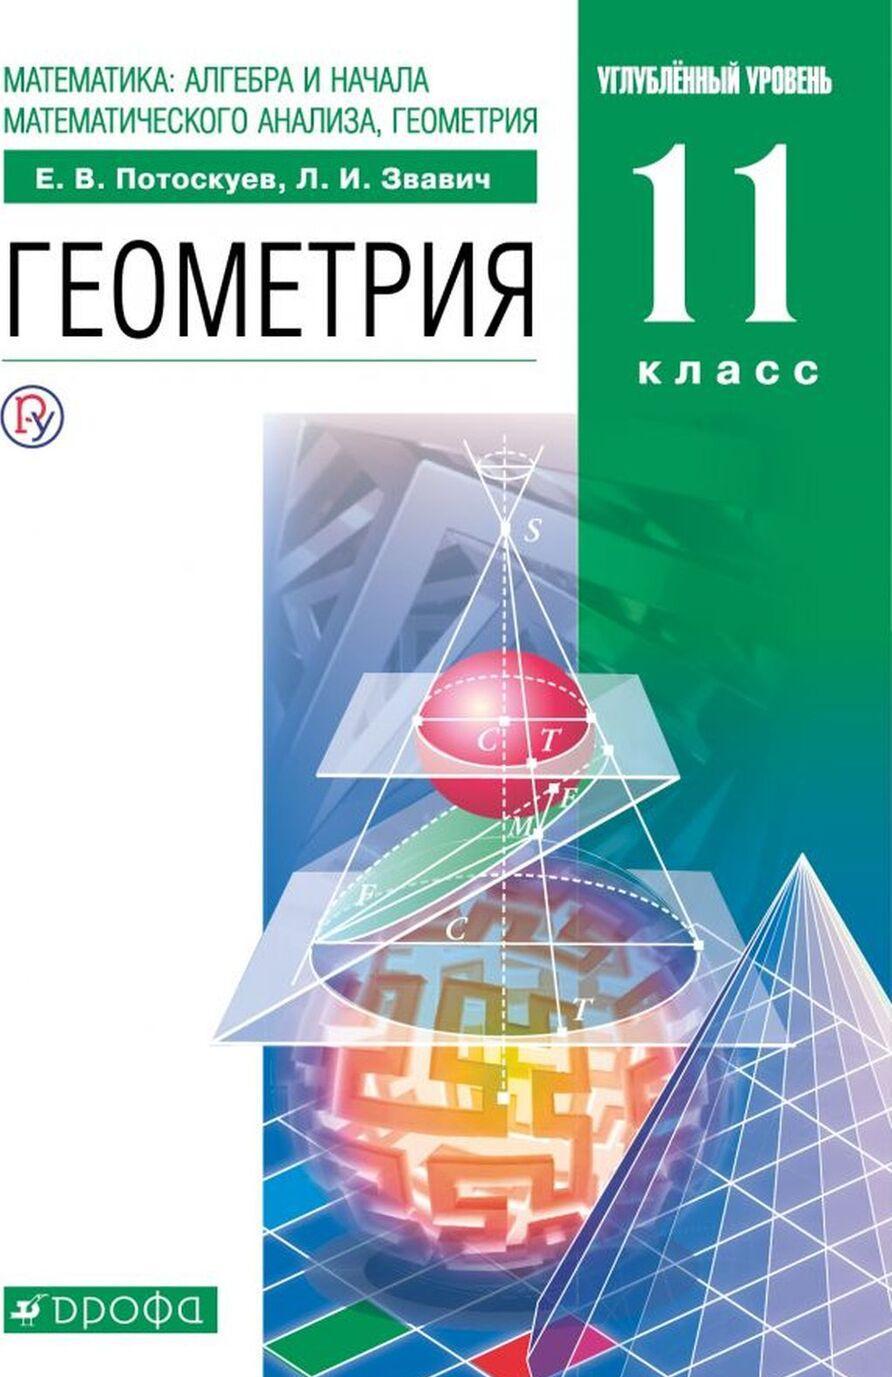 Geometrija. 11 klass. Uchebnik (+ zadachnik) | Potoskuev Evgenij Viktorovich, Zvavich Leonid Isaakovich